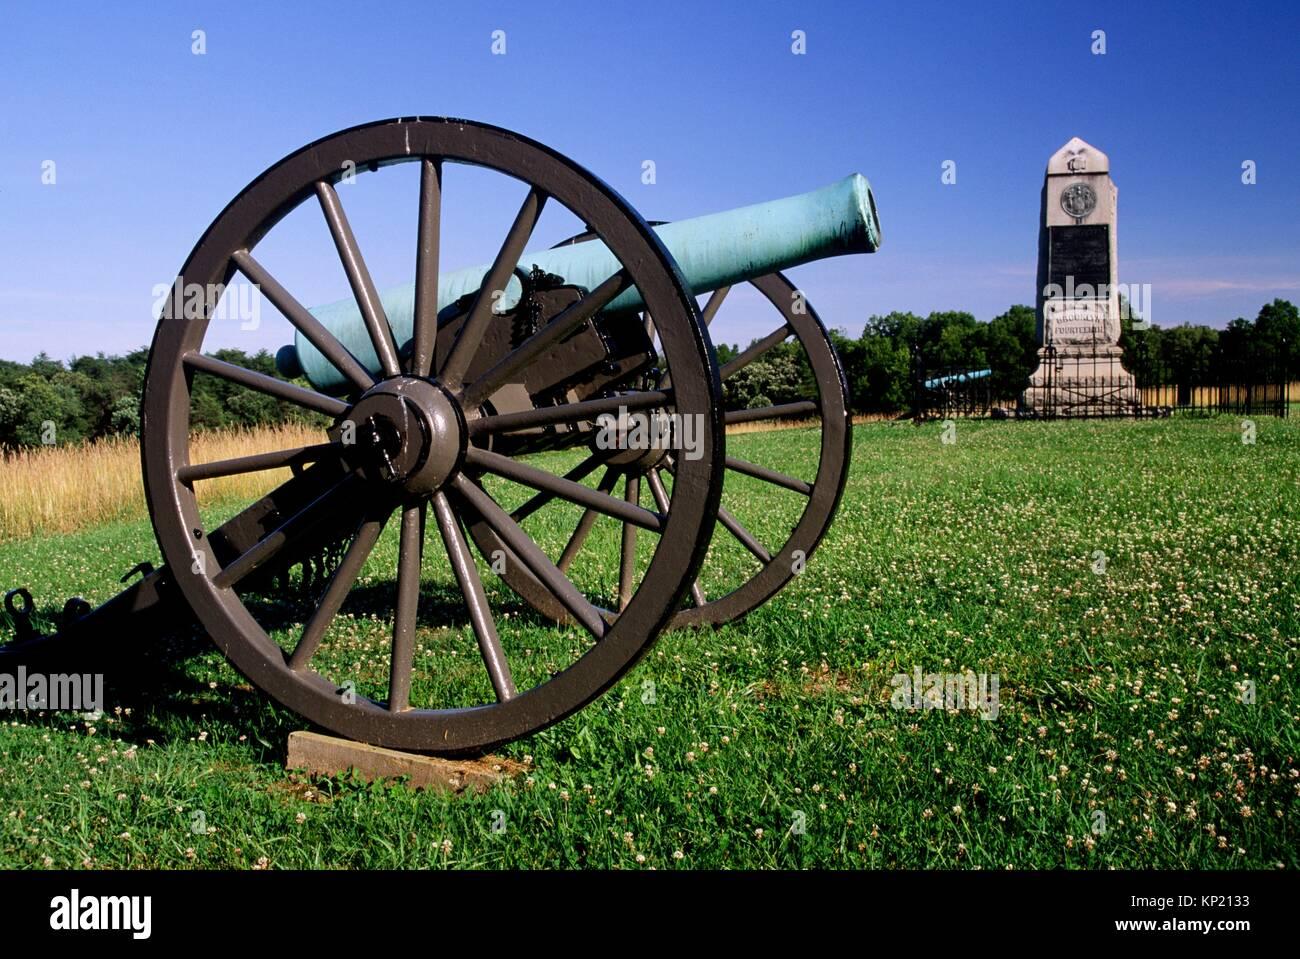 Brooklyn Fourteenth Monument with cannon, Manassas National Battlefield Park, Virginia. - Stock Image